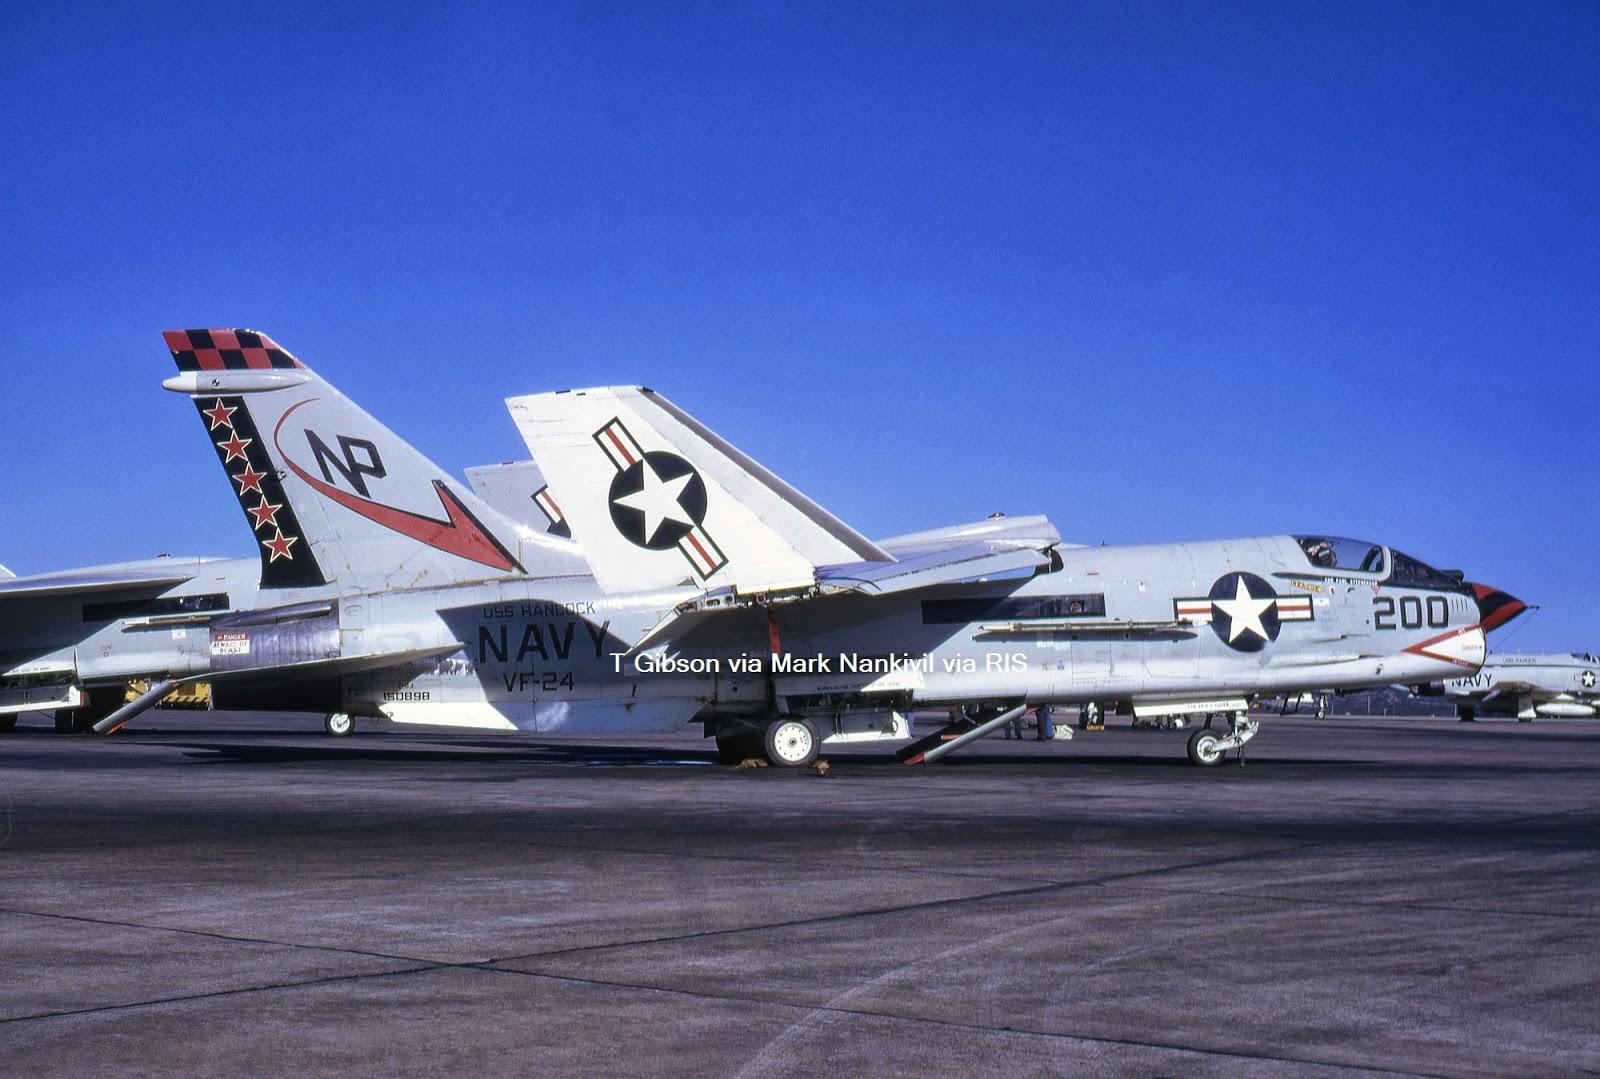 z150898+F-8J+VF-24+Miramar+TGibson+Nov-8